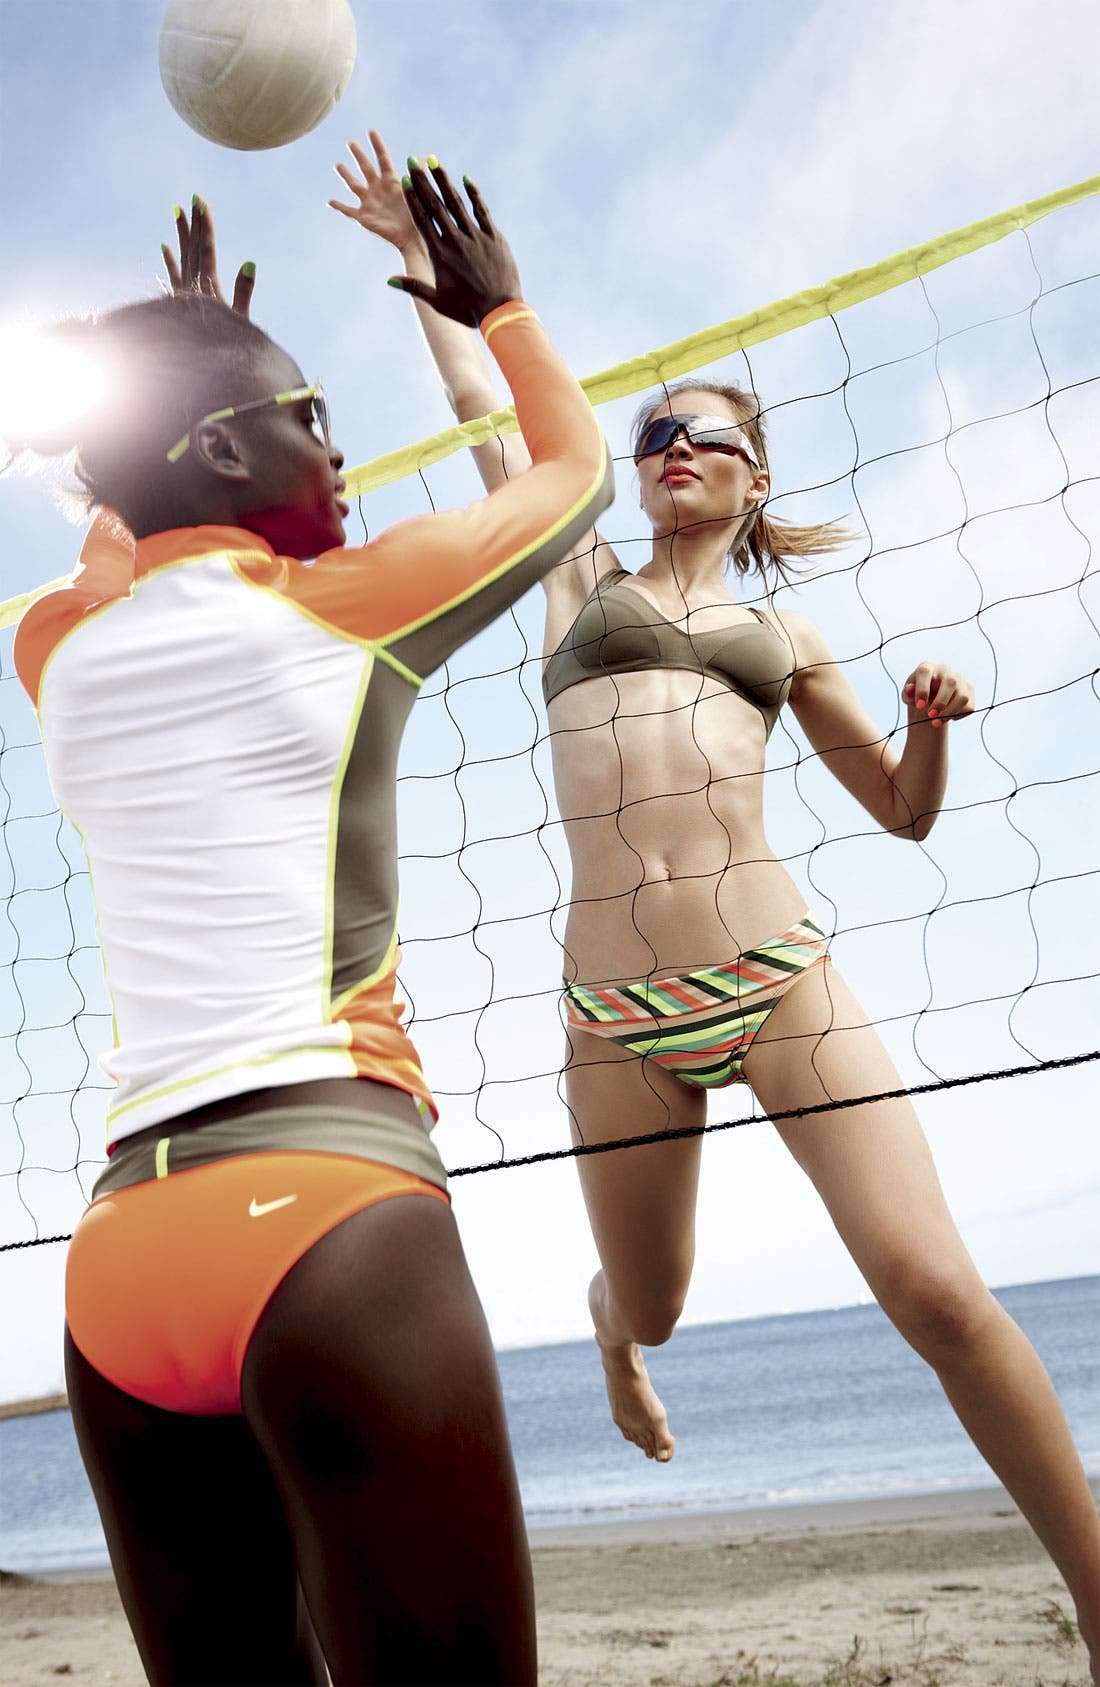 Main Image - Nike Bikini Top & Bottoms